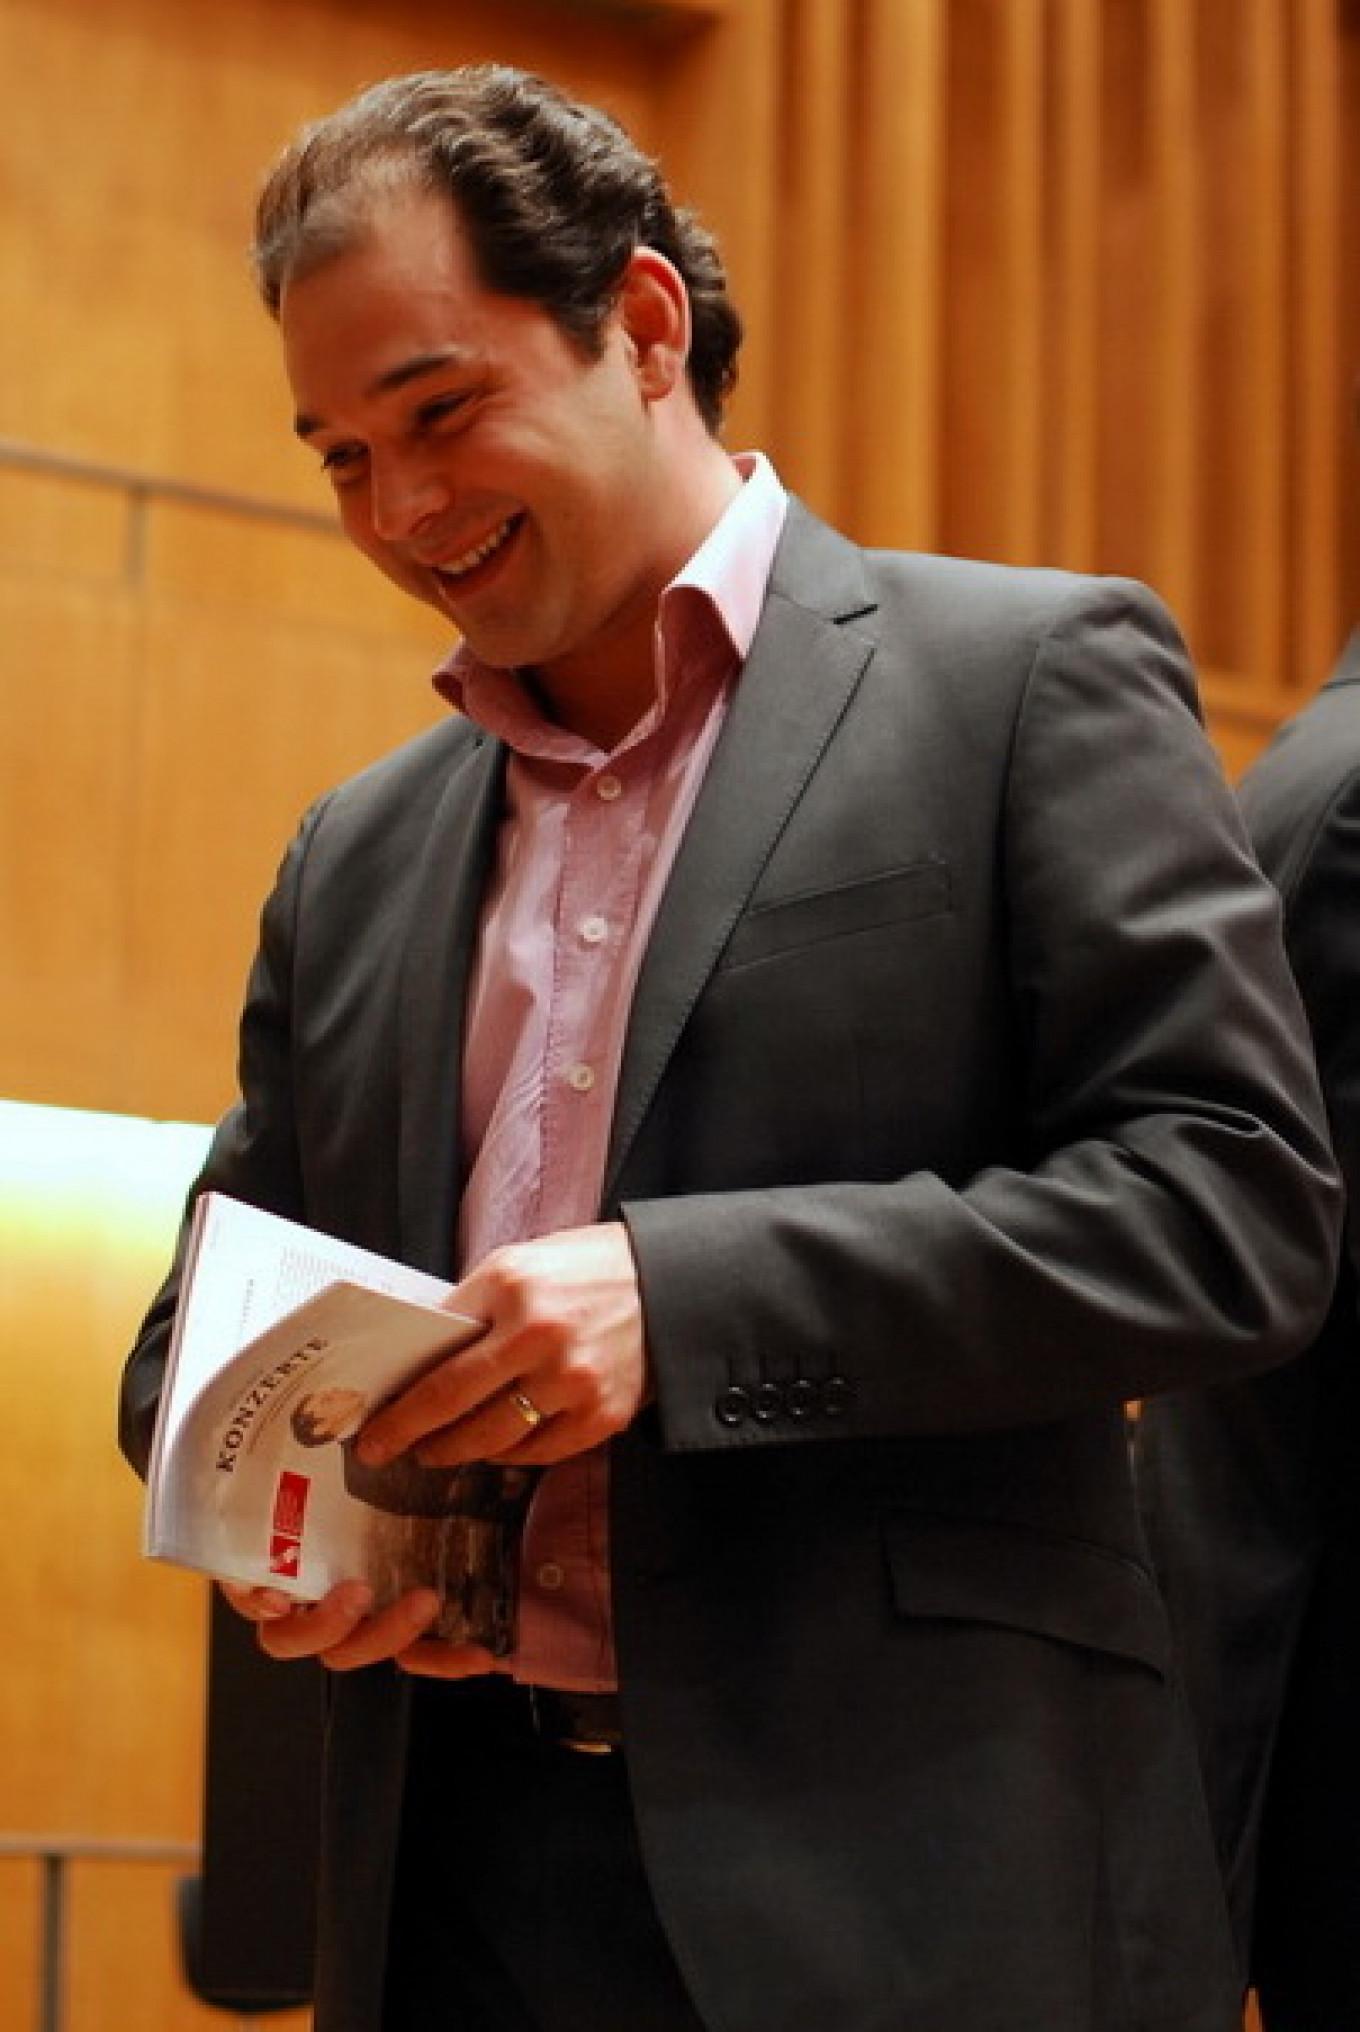 Conductor Tugan Sokhiev  Frank Guschmann / FotoFrank / Wikicommons